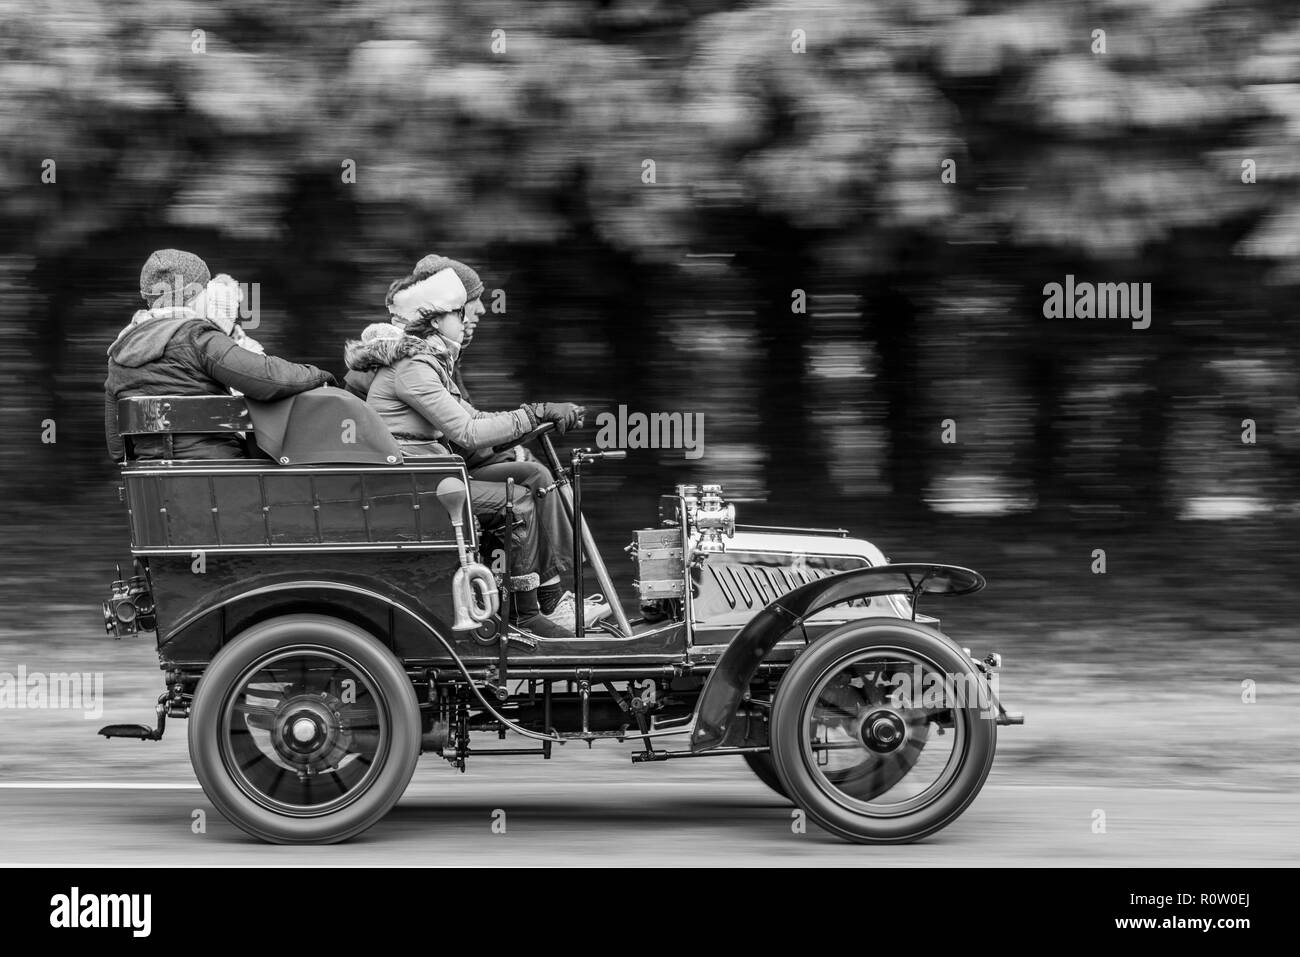 Veteran cars pass through Staplefield whilst taking part in the annual London to Brighton Veteran Car Run - 2018 Stock Photo